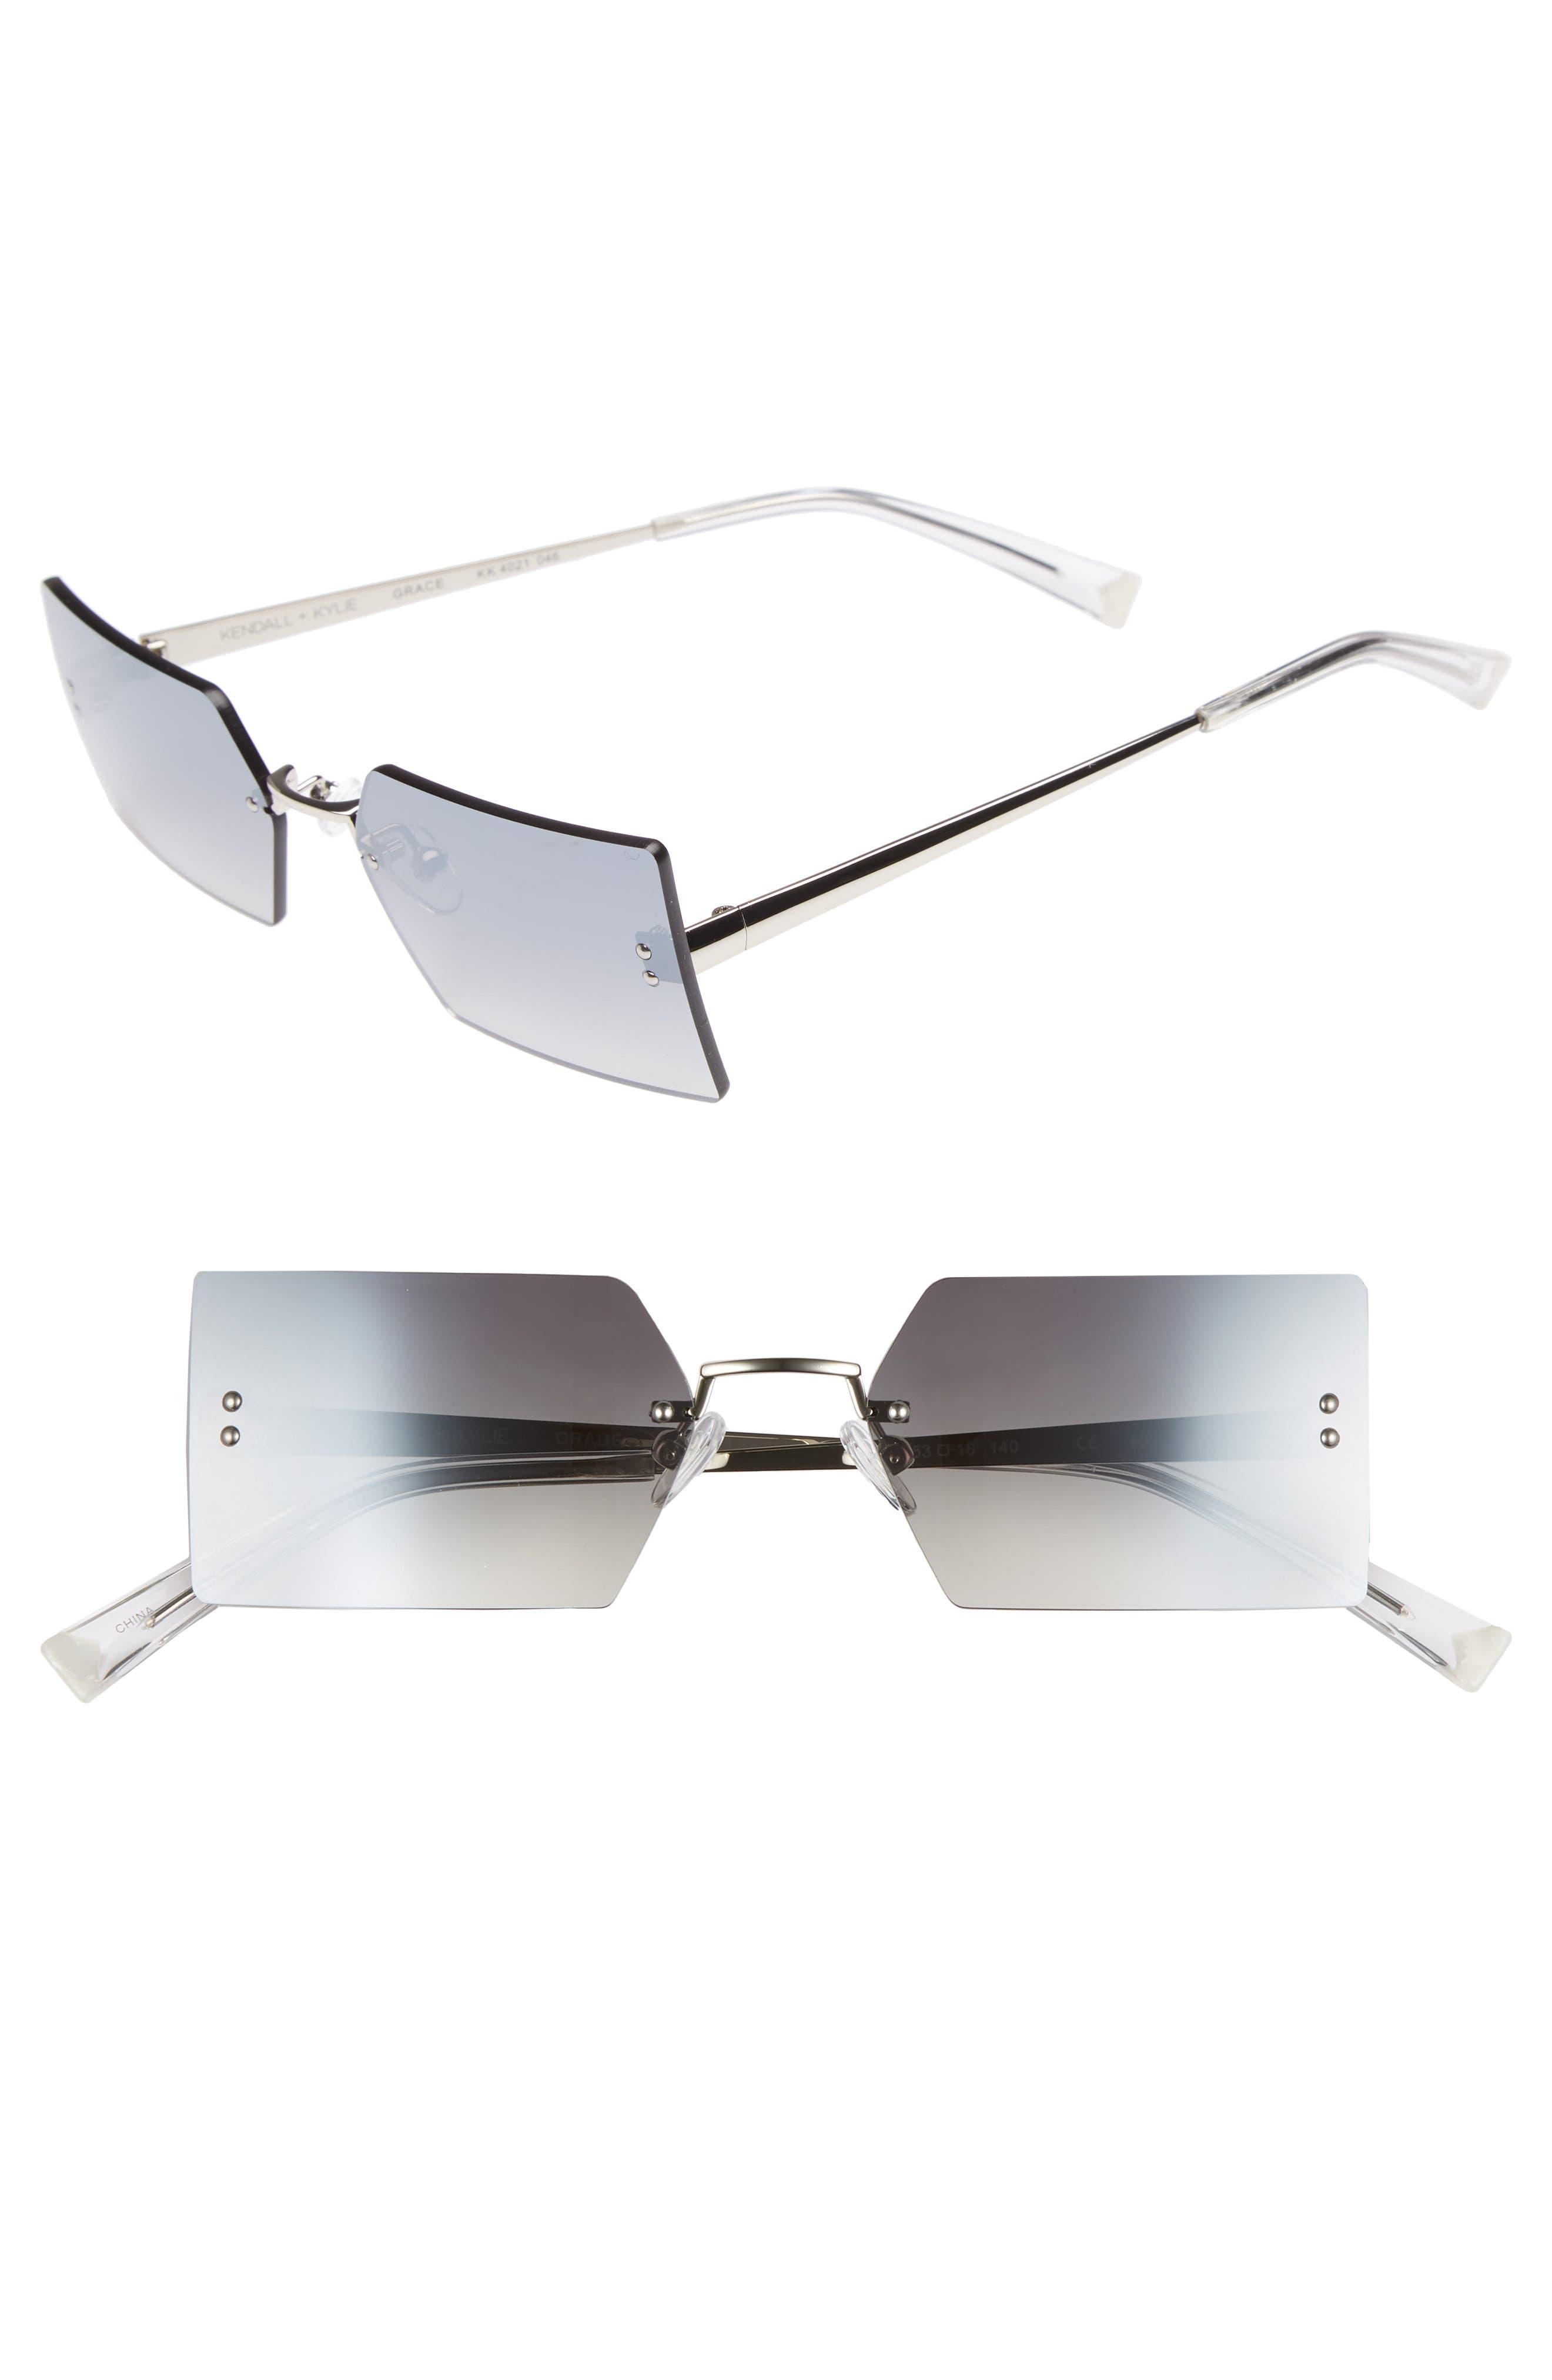 Grace 53mm Rimless Rectangular Sunglasses,                         Main,                         color, Silver/ Smoke Gradient Flash